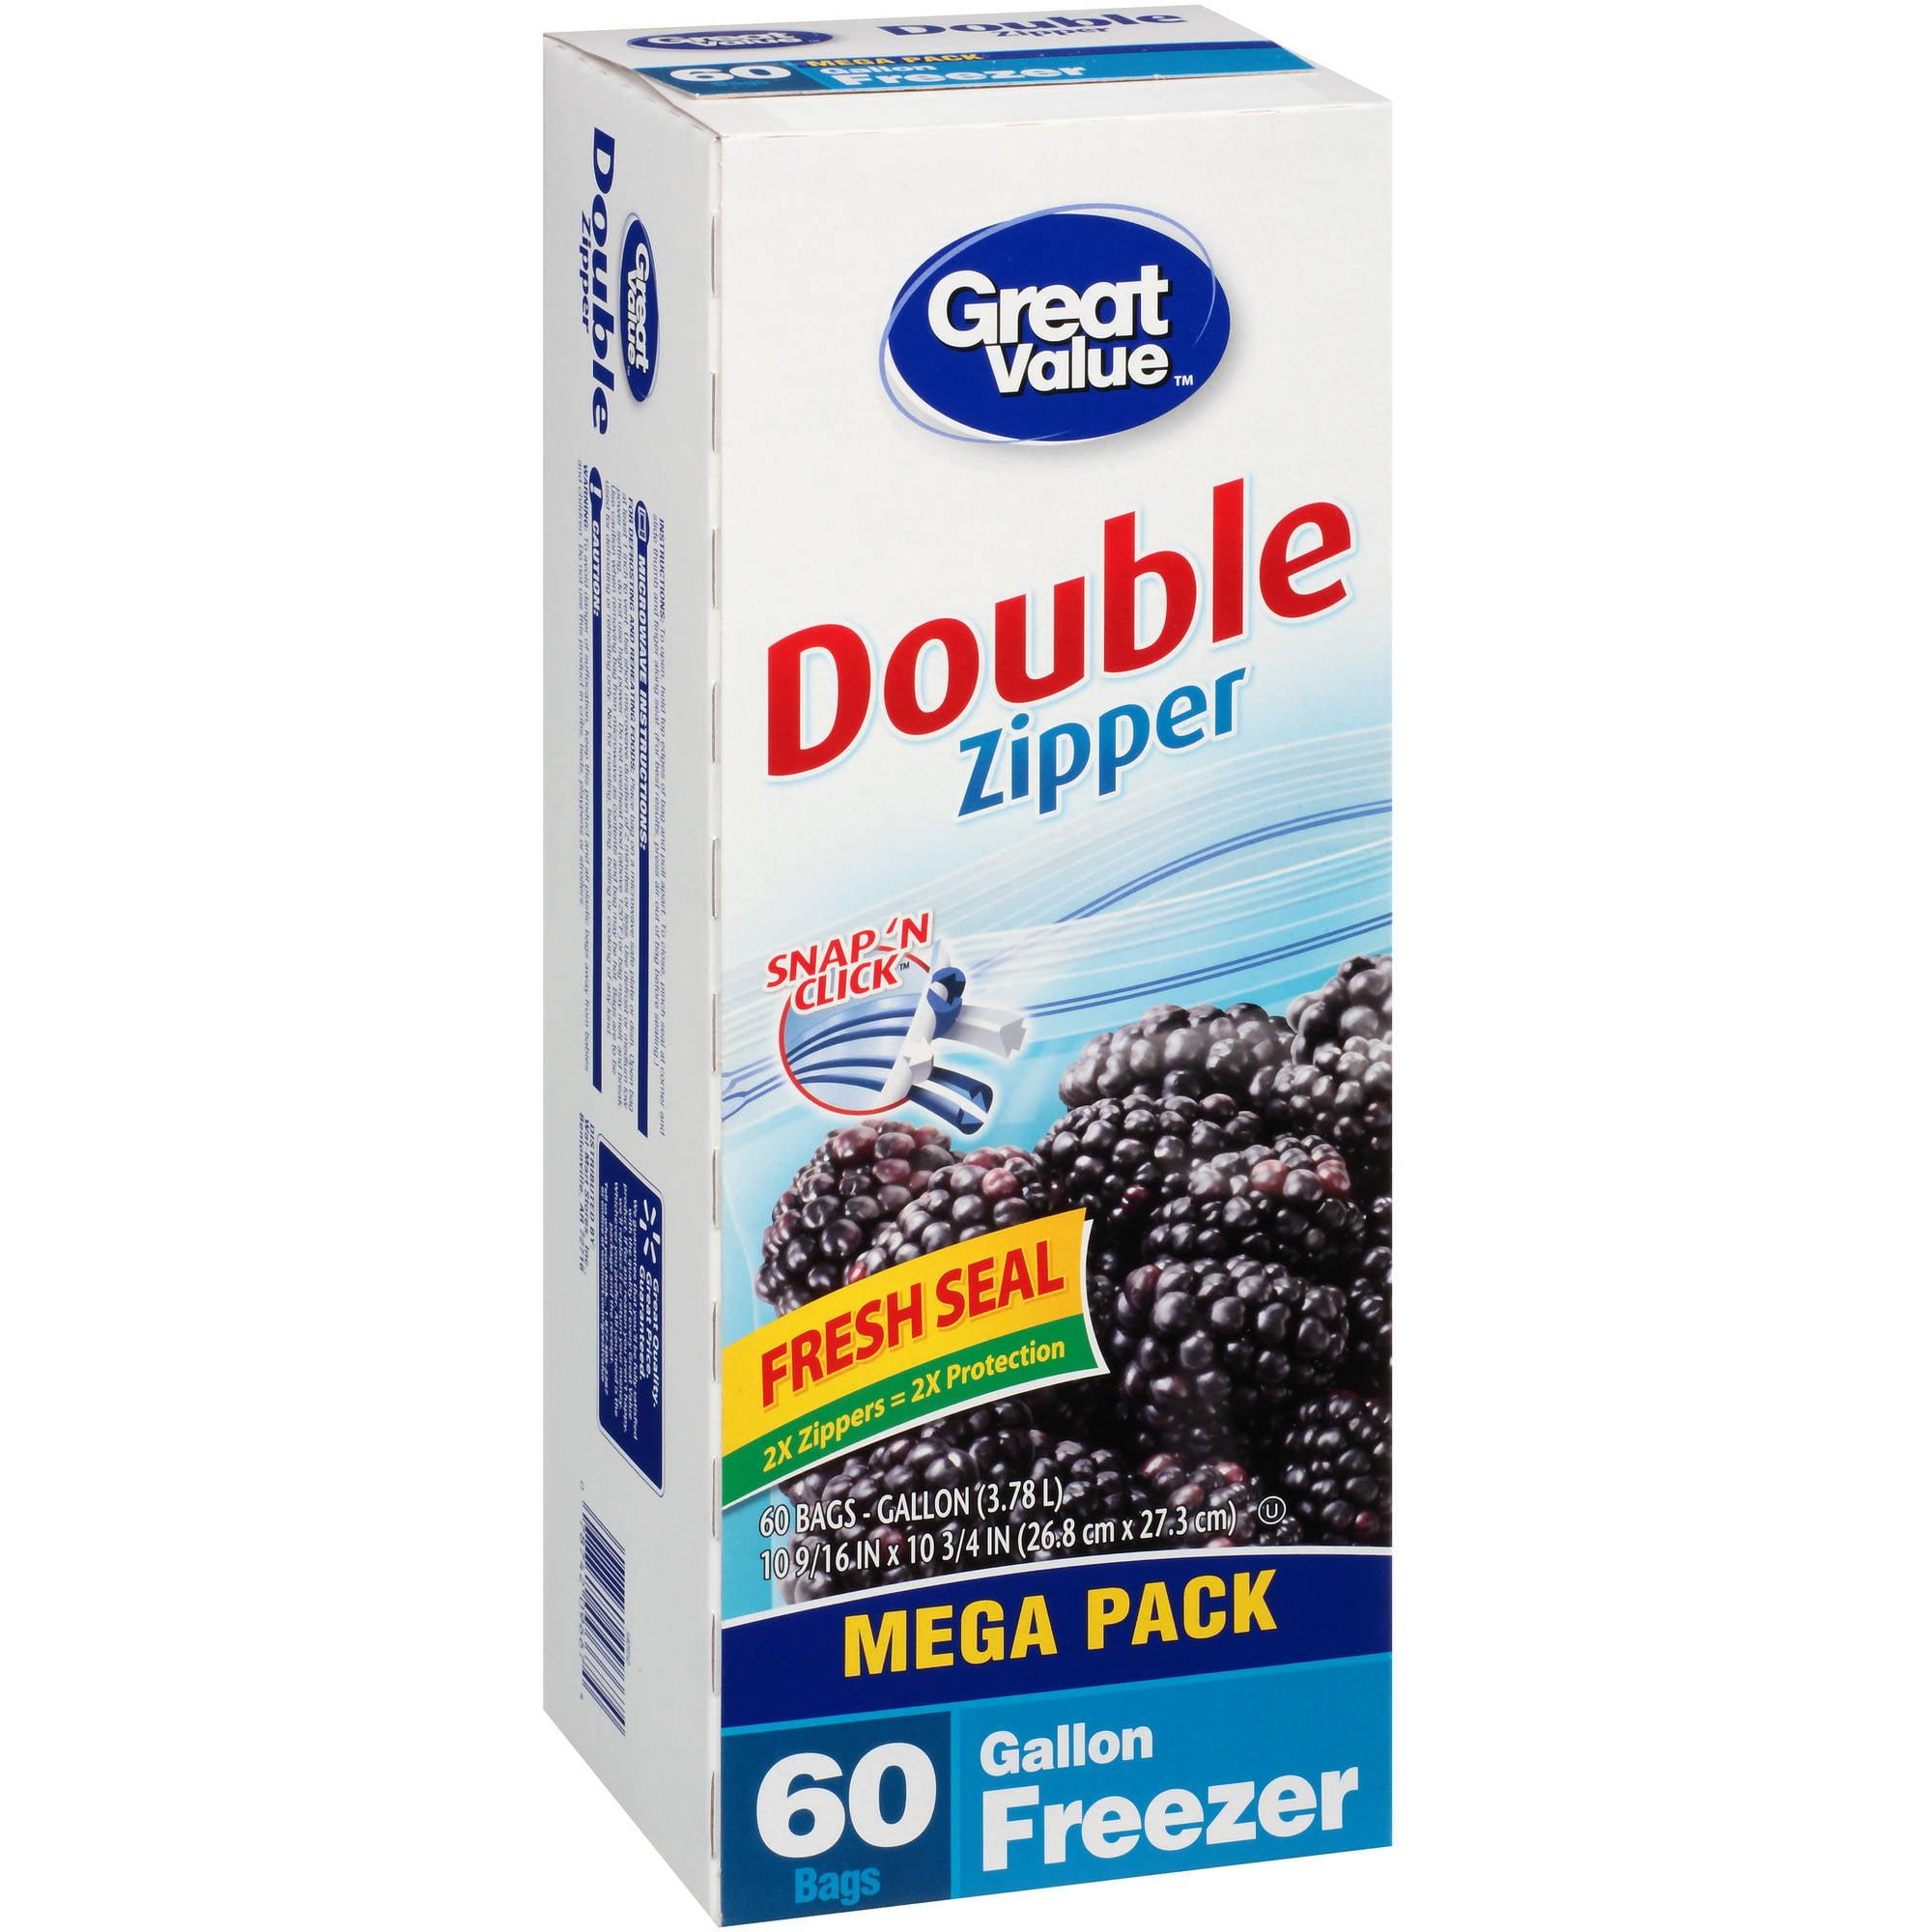 Great Value Double Zipper Gallon Size Freezer Storage Bags, 60 count